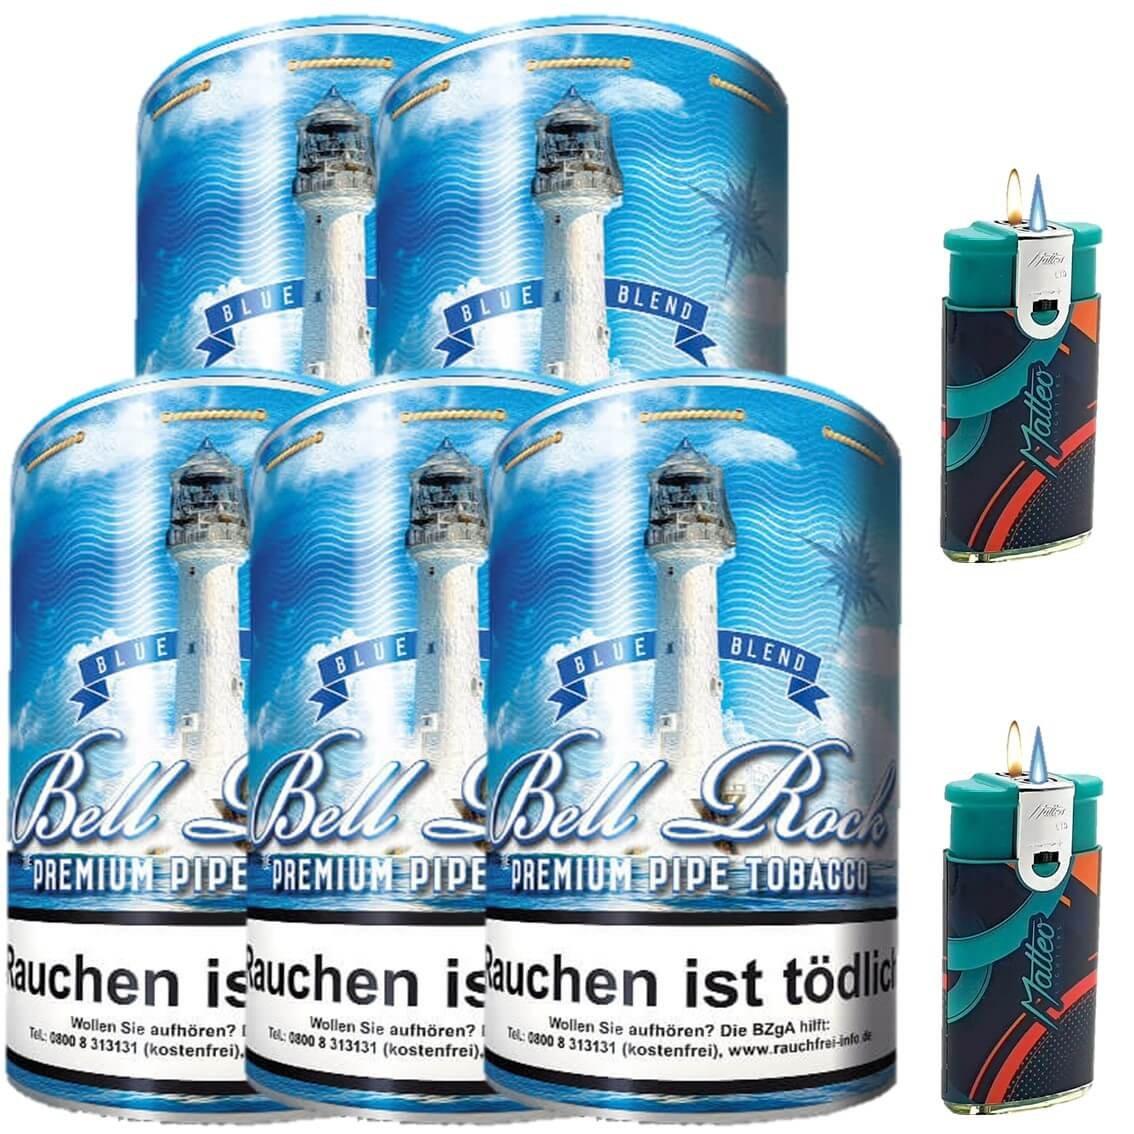 Bell Rock Blue Blend 5 x 160g Pfeifentabak 2 x Duo Feuerzeuge mit 2 Flammen